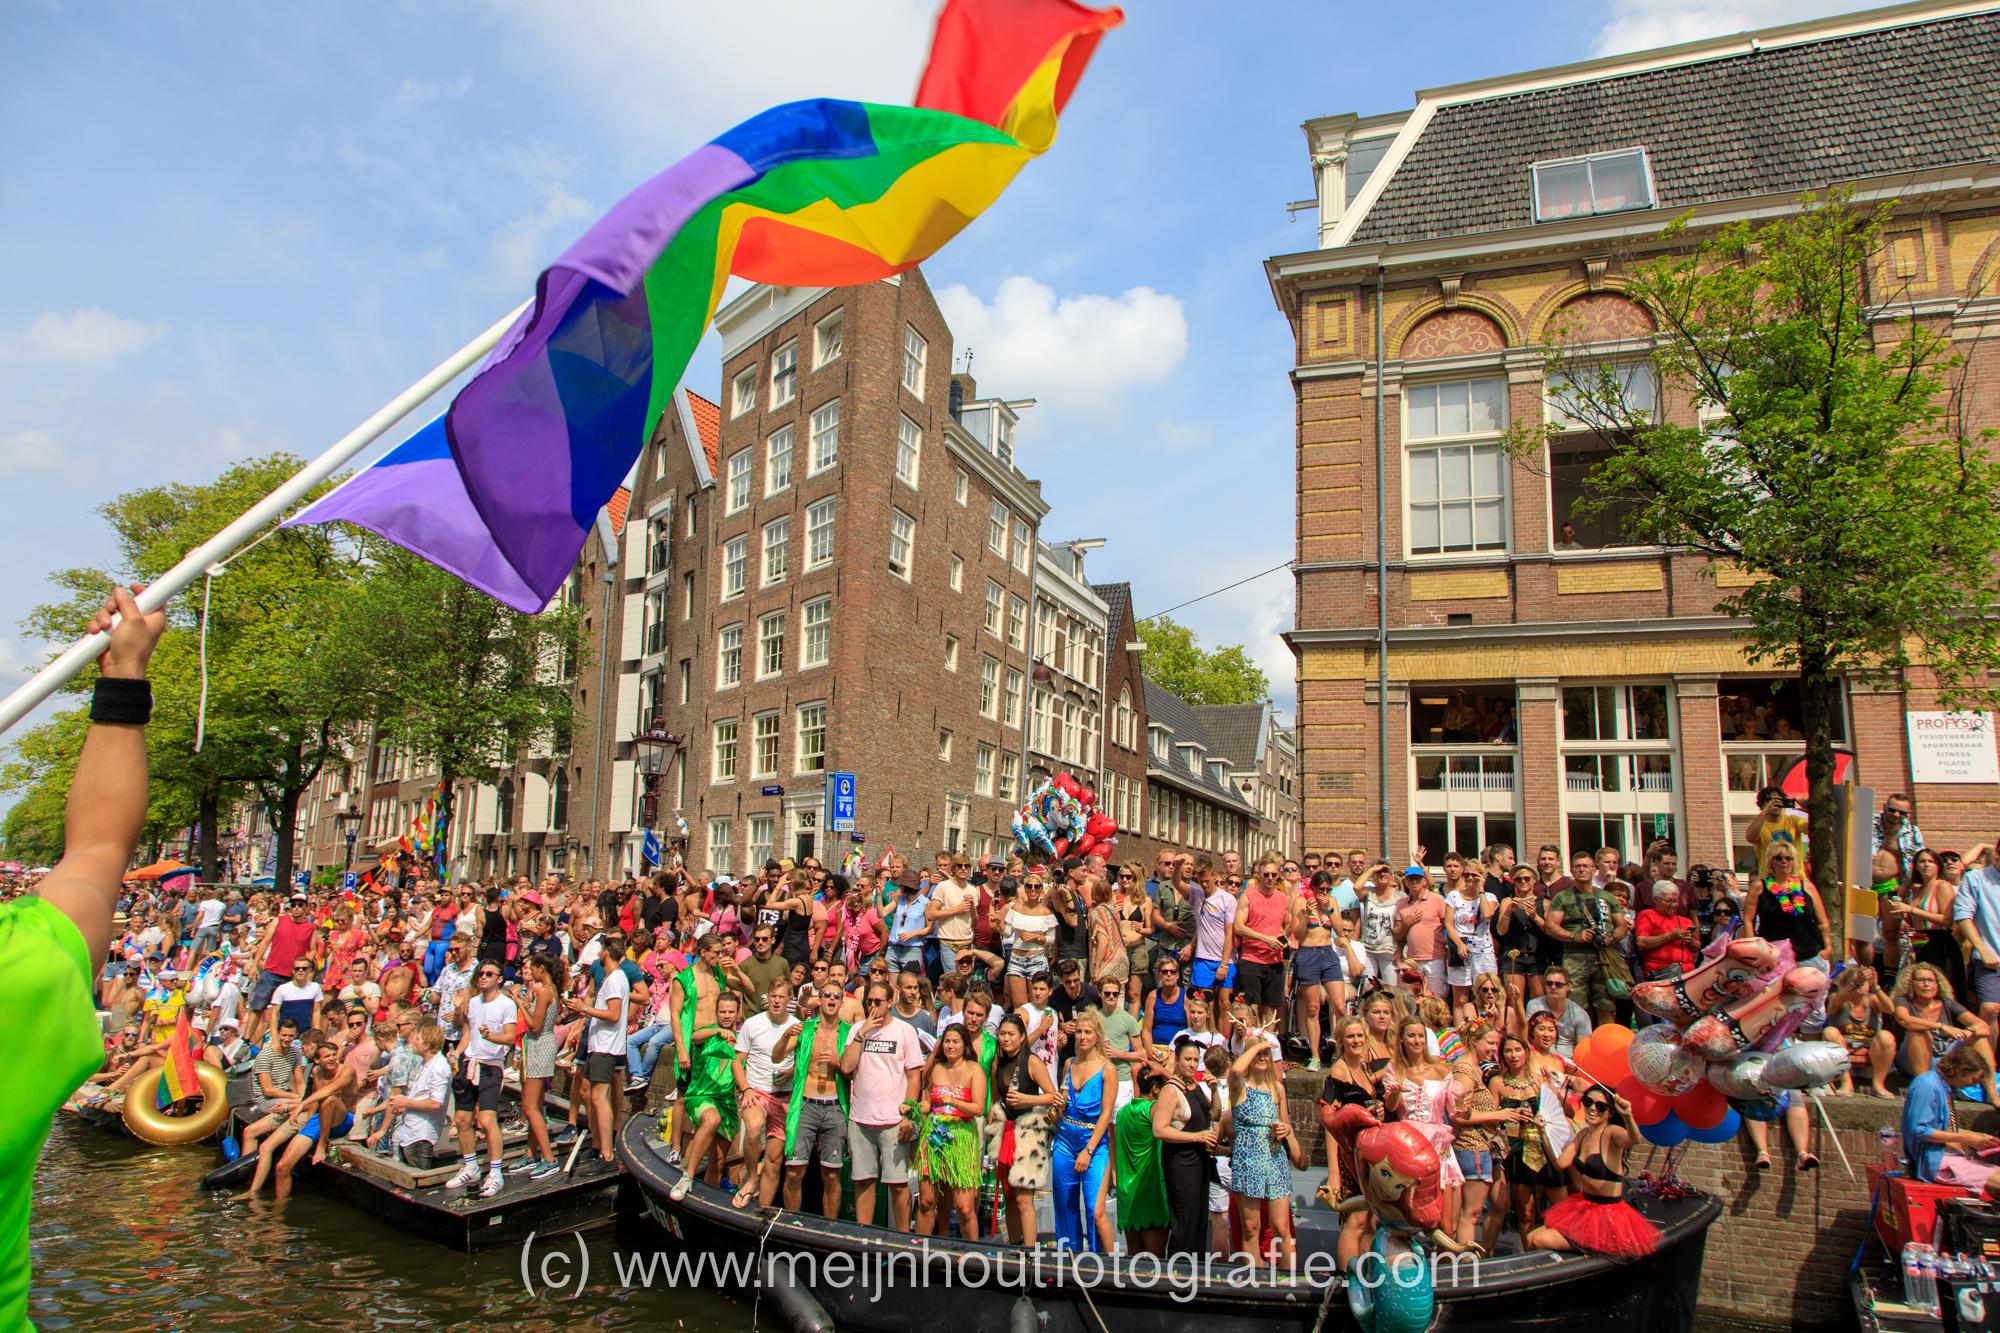 20180804-_MG_0348 Deloitte Gay Pride 2018.jpg